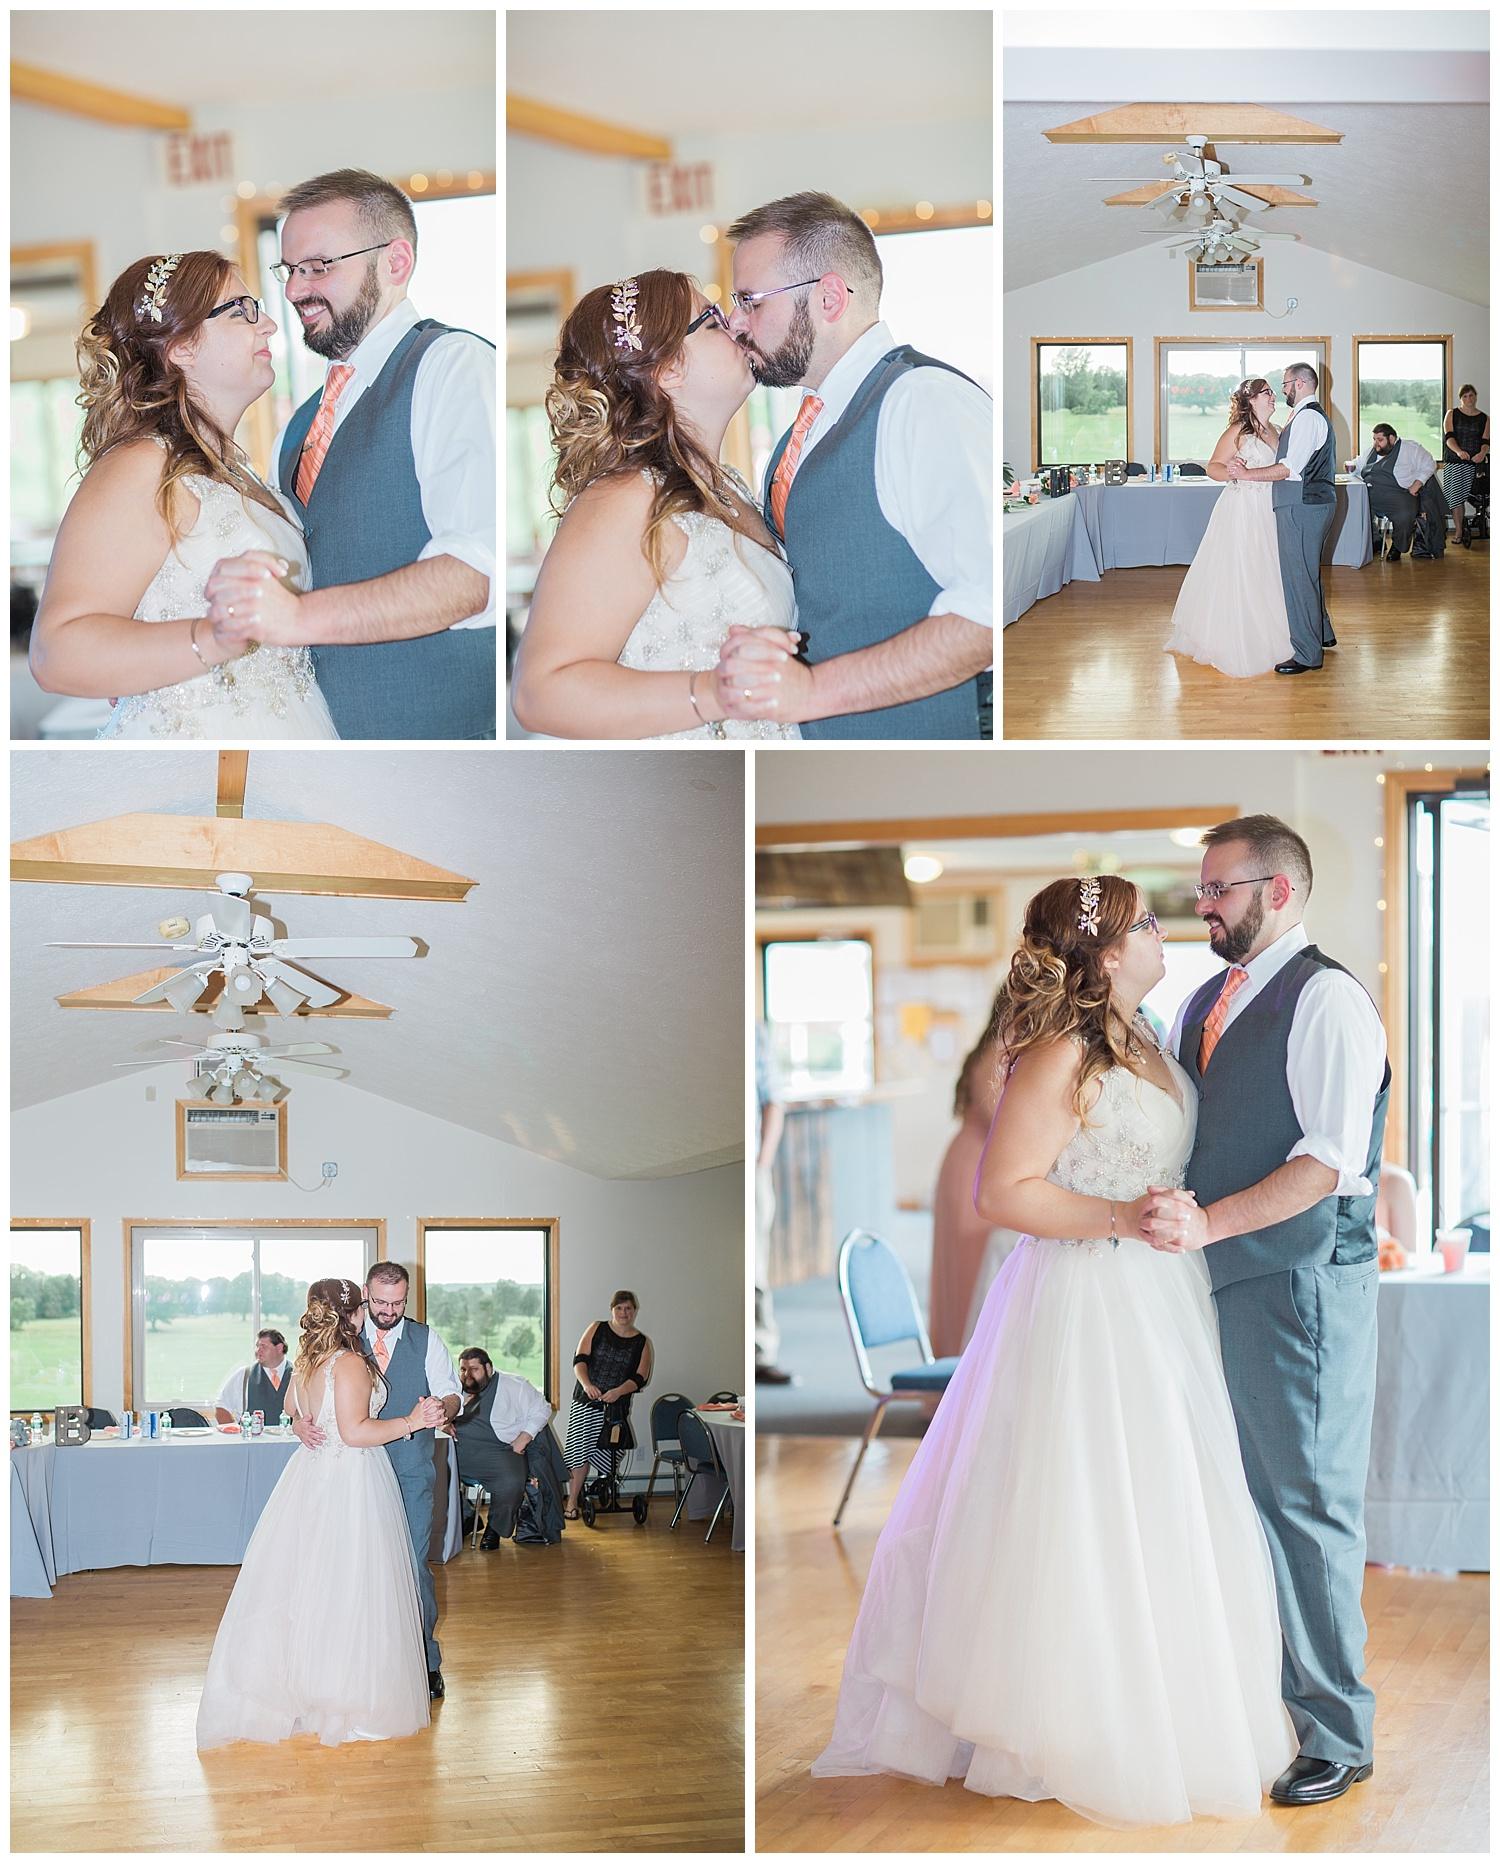 Brian and Molly Wed in Conesus NY - Lass & Beau-1147_Buffalo wedding photography.jpg